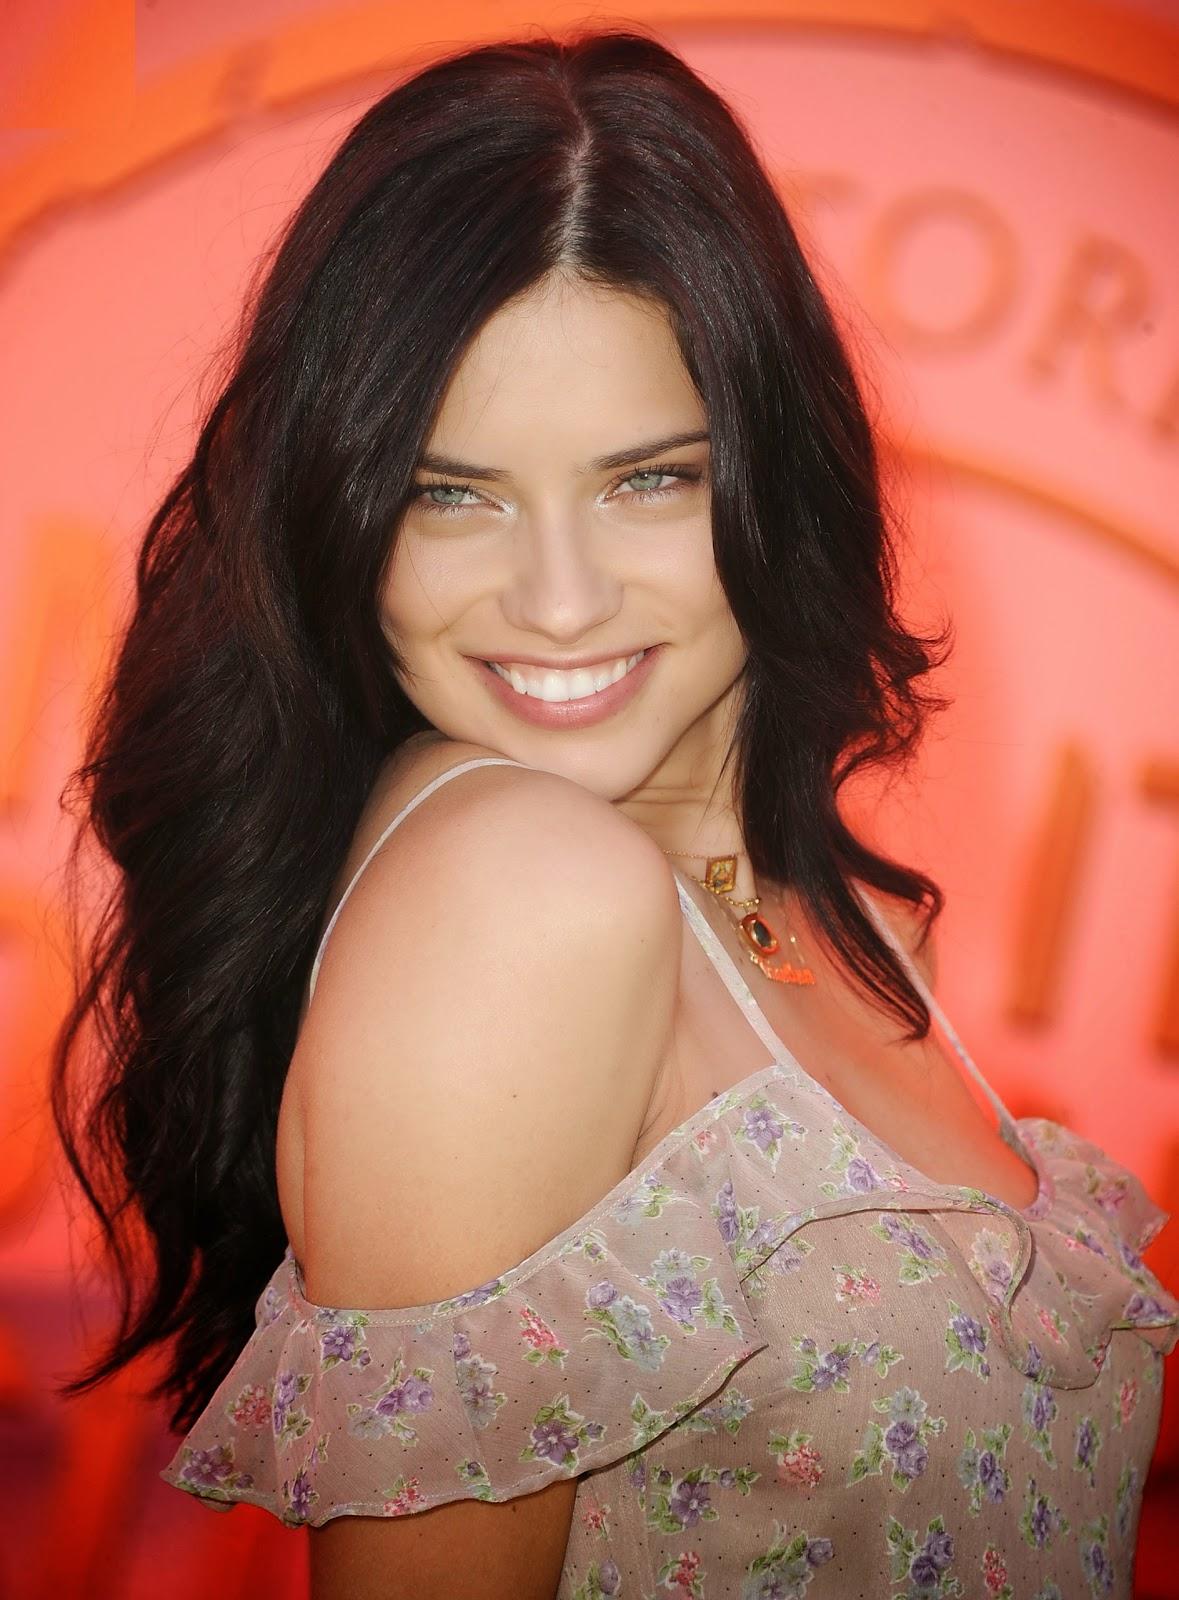 Brazilian Victoria's Secret Fashion Show Model Actress Adriana Lima Full HD Photos & Wallpapers